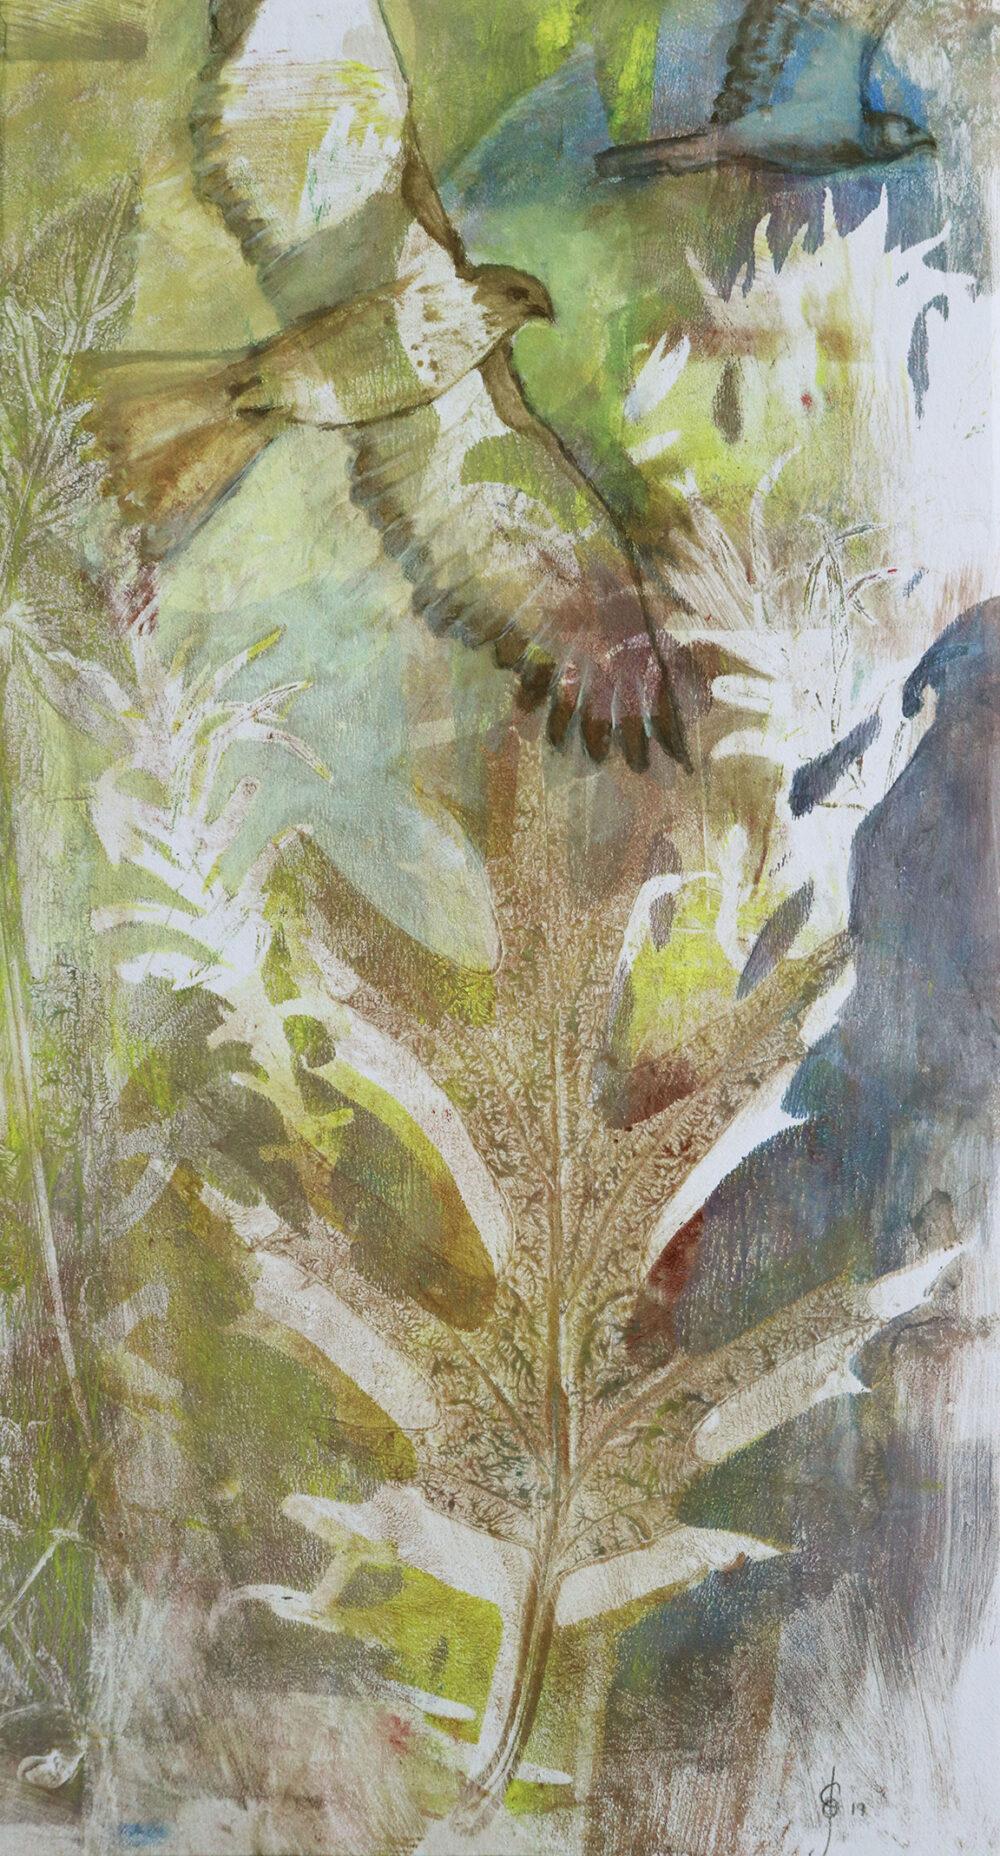 peinture-buses-en-vol-impression-botanique-artiste-peintre-carine-genadry